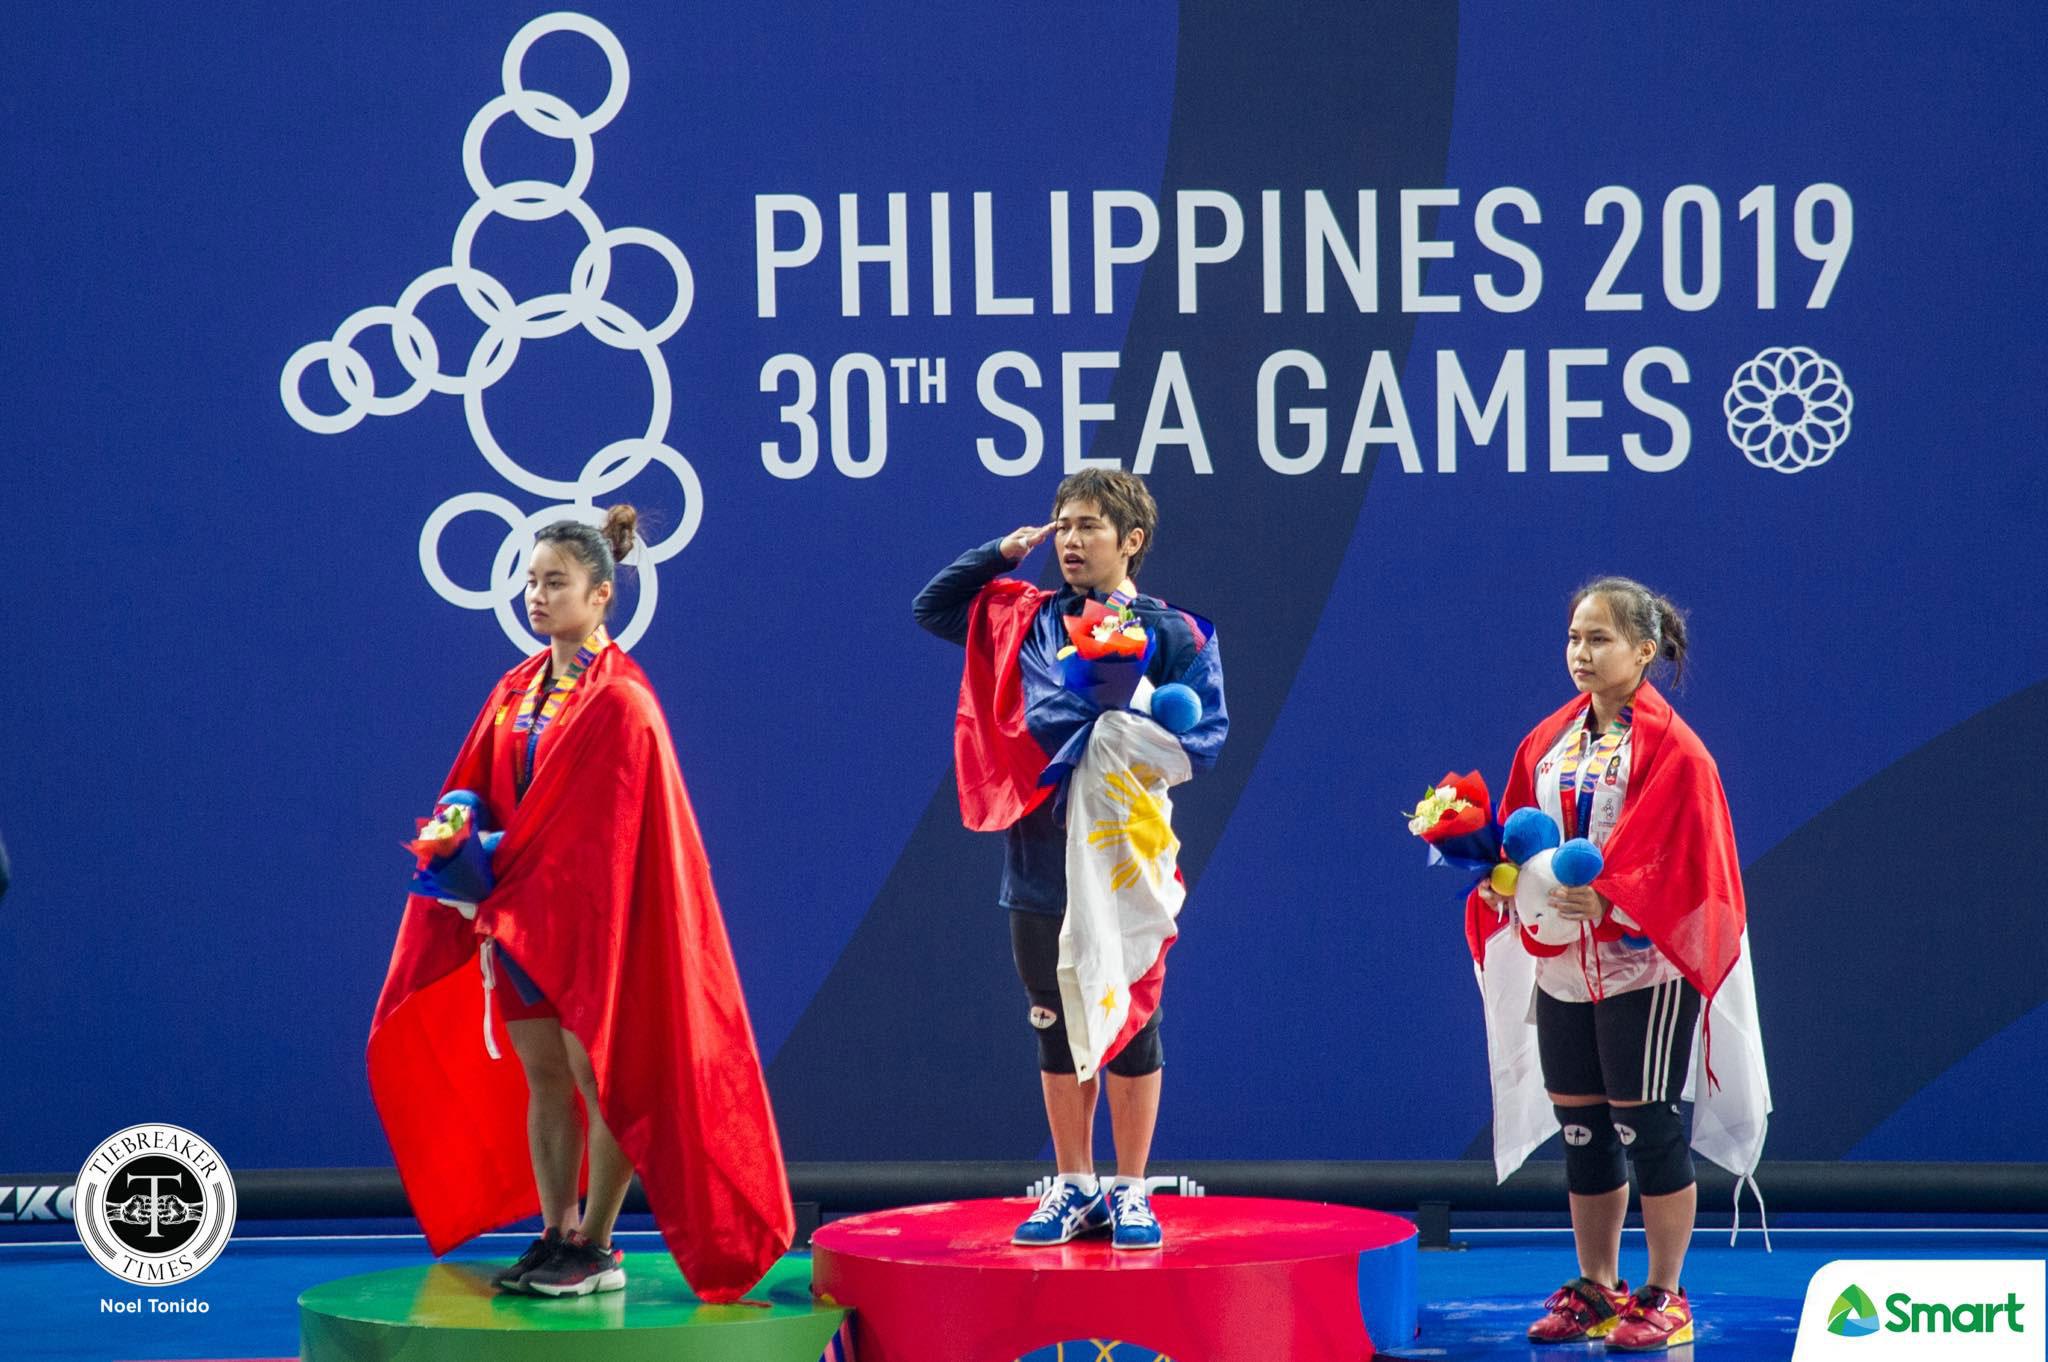 Tiebreaker Times Hidilyn Diaz looks back on long journey to SEA Games gold 2019 SEA Games News Weightlifting  Hidilyn Diaz 2019 SEA Games - Weightlifting 2019 SEA Games